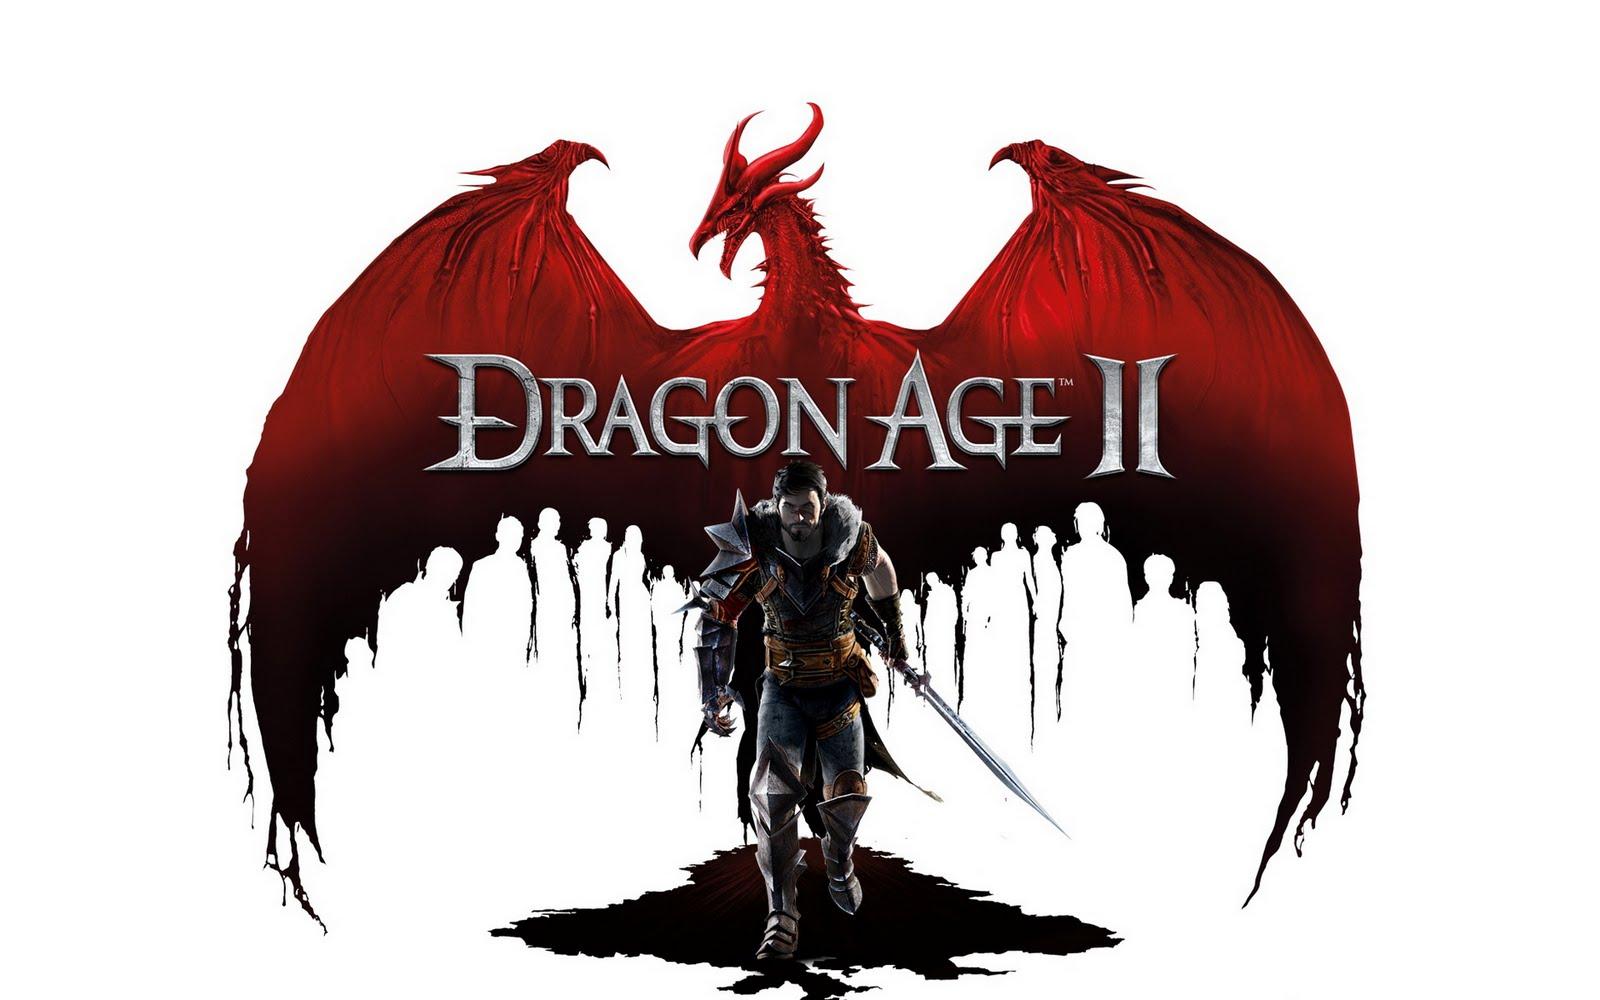 http://2.bp.blogspot.com/-0Gv0SXBd6kc/Ti0HiqB4bdI/AAAAAAAAAQs/CNJeTc1FbwM/s1600/dragon_age_ii_2011_game-wide-GAMESCAY.jpg